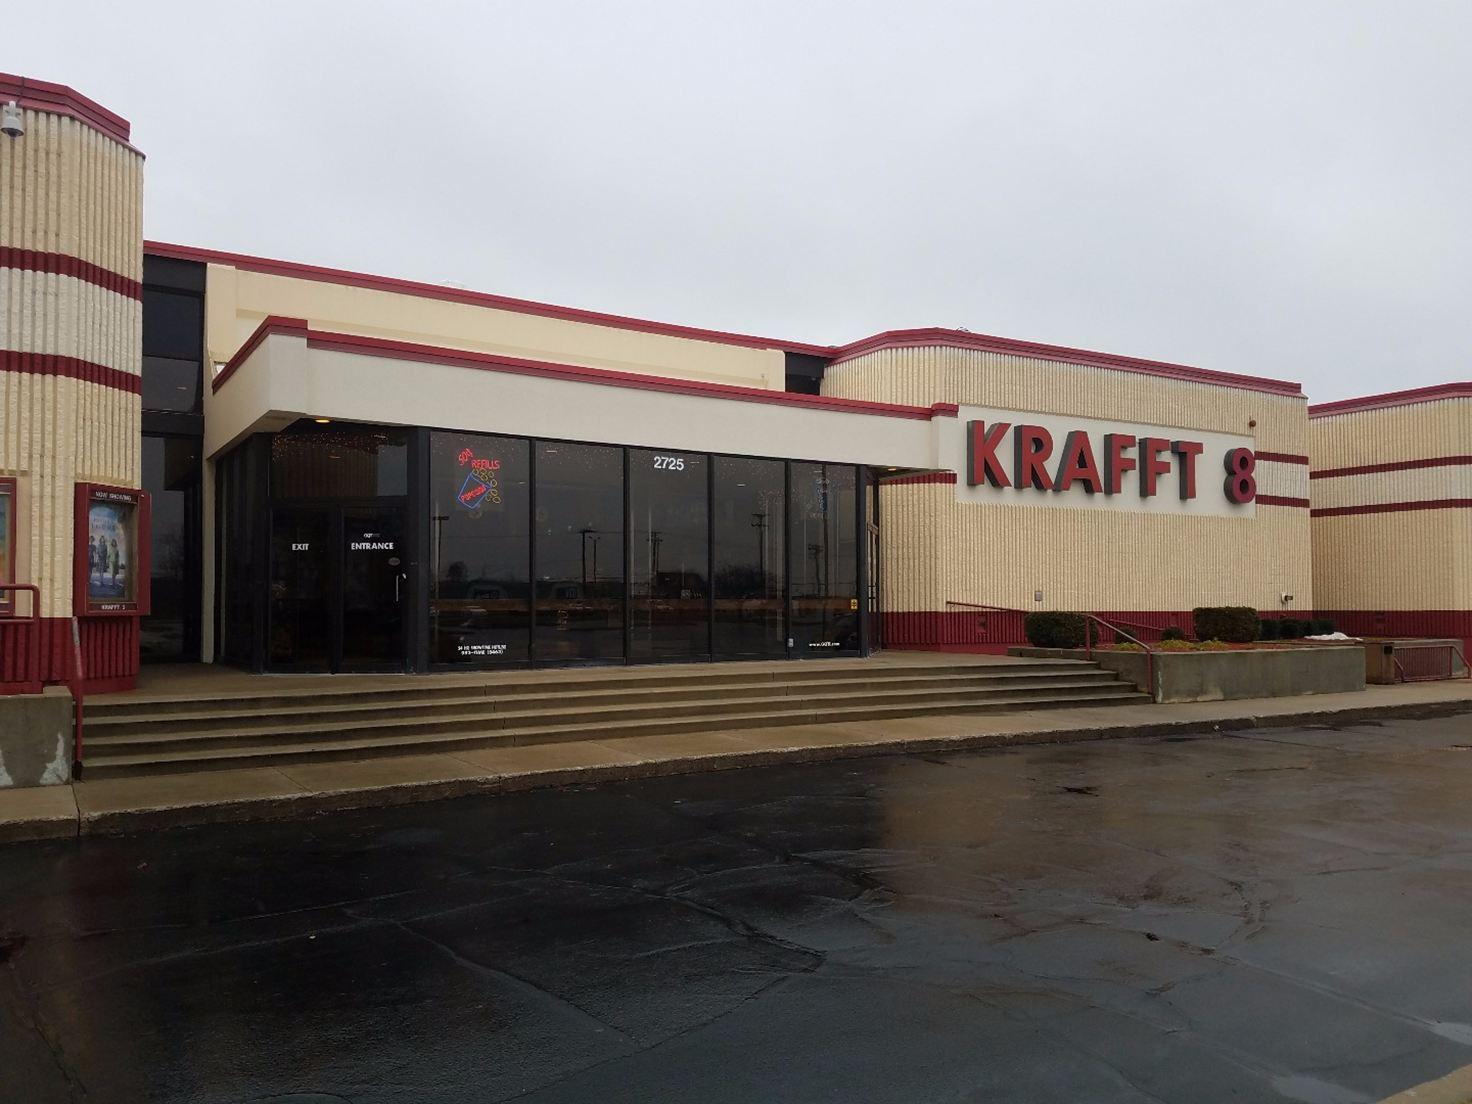 GQT Krafft 8